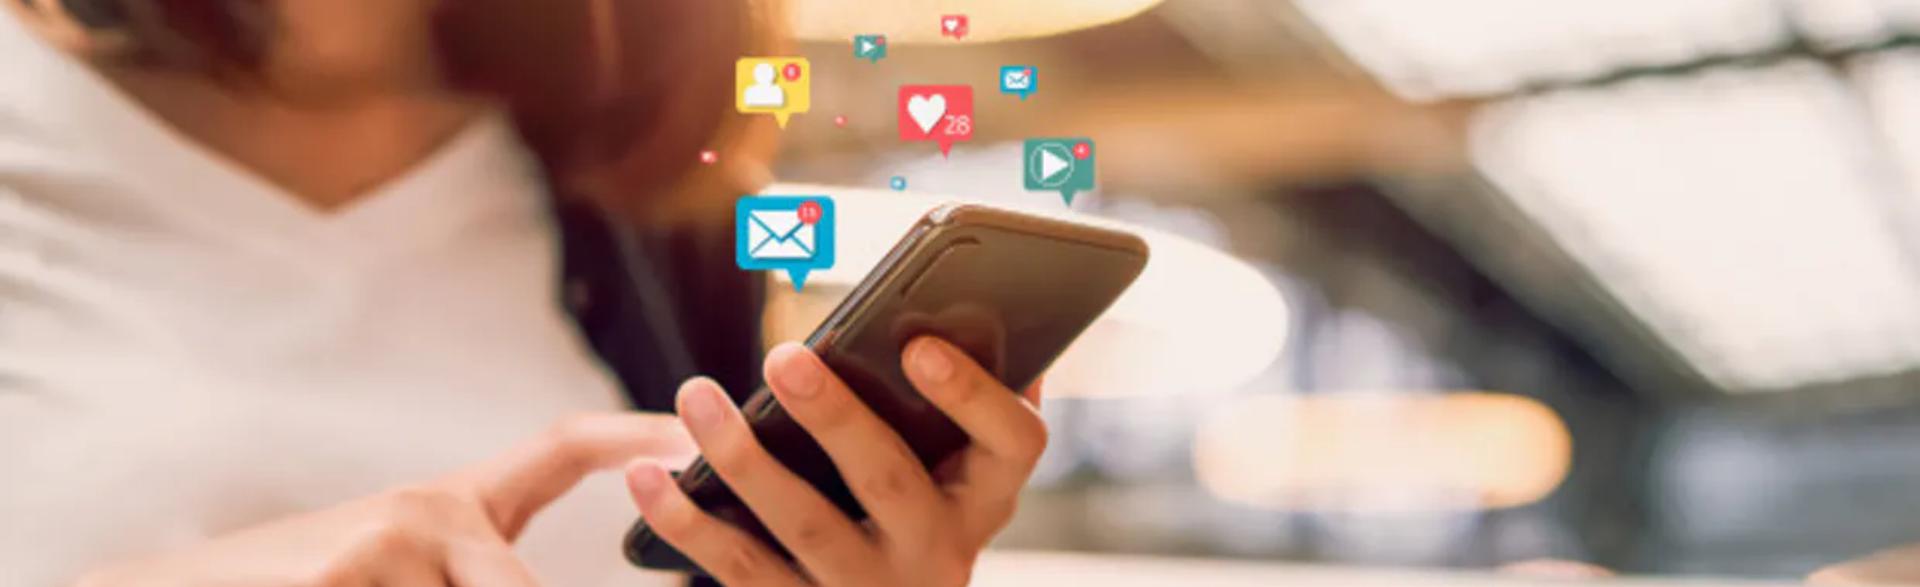 Social Media Marketing 1.png